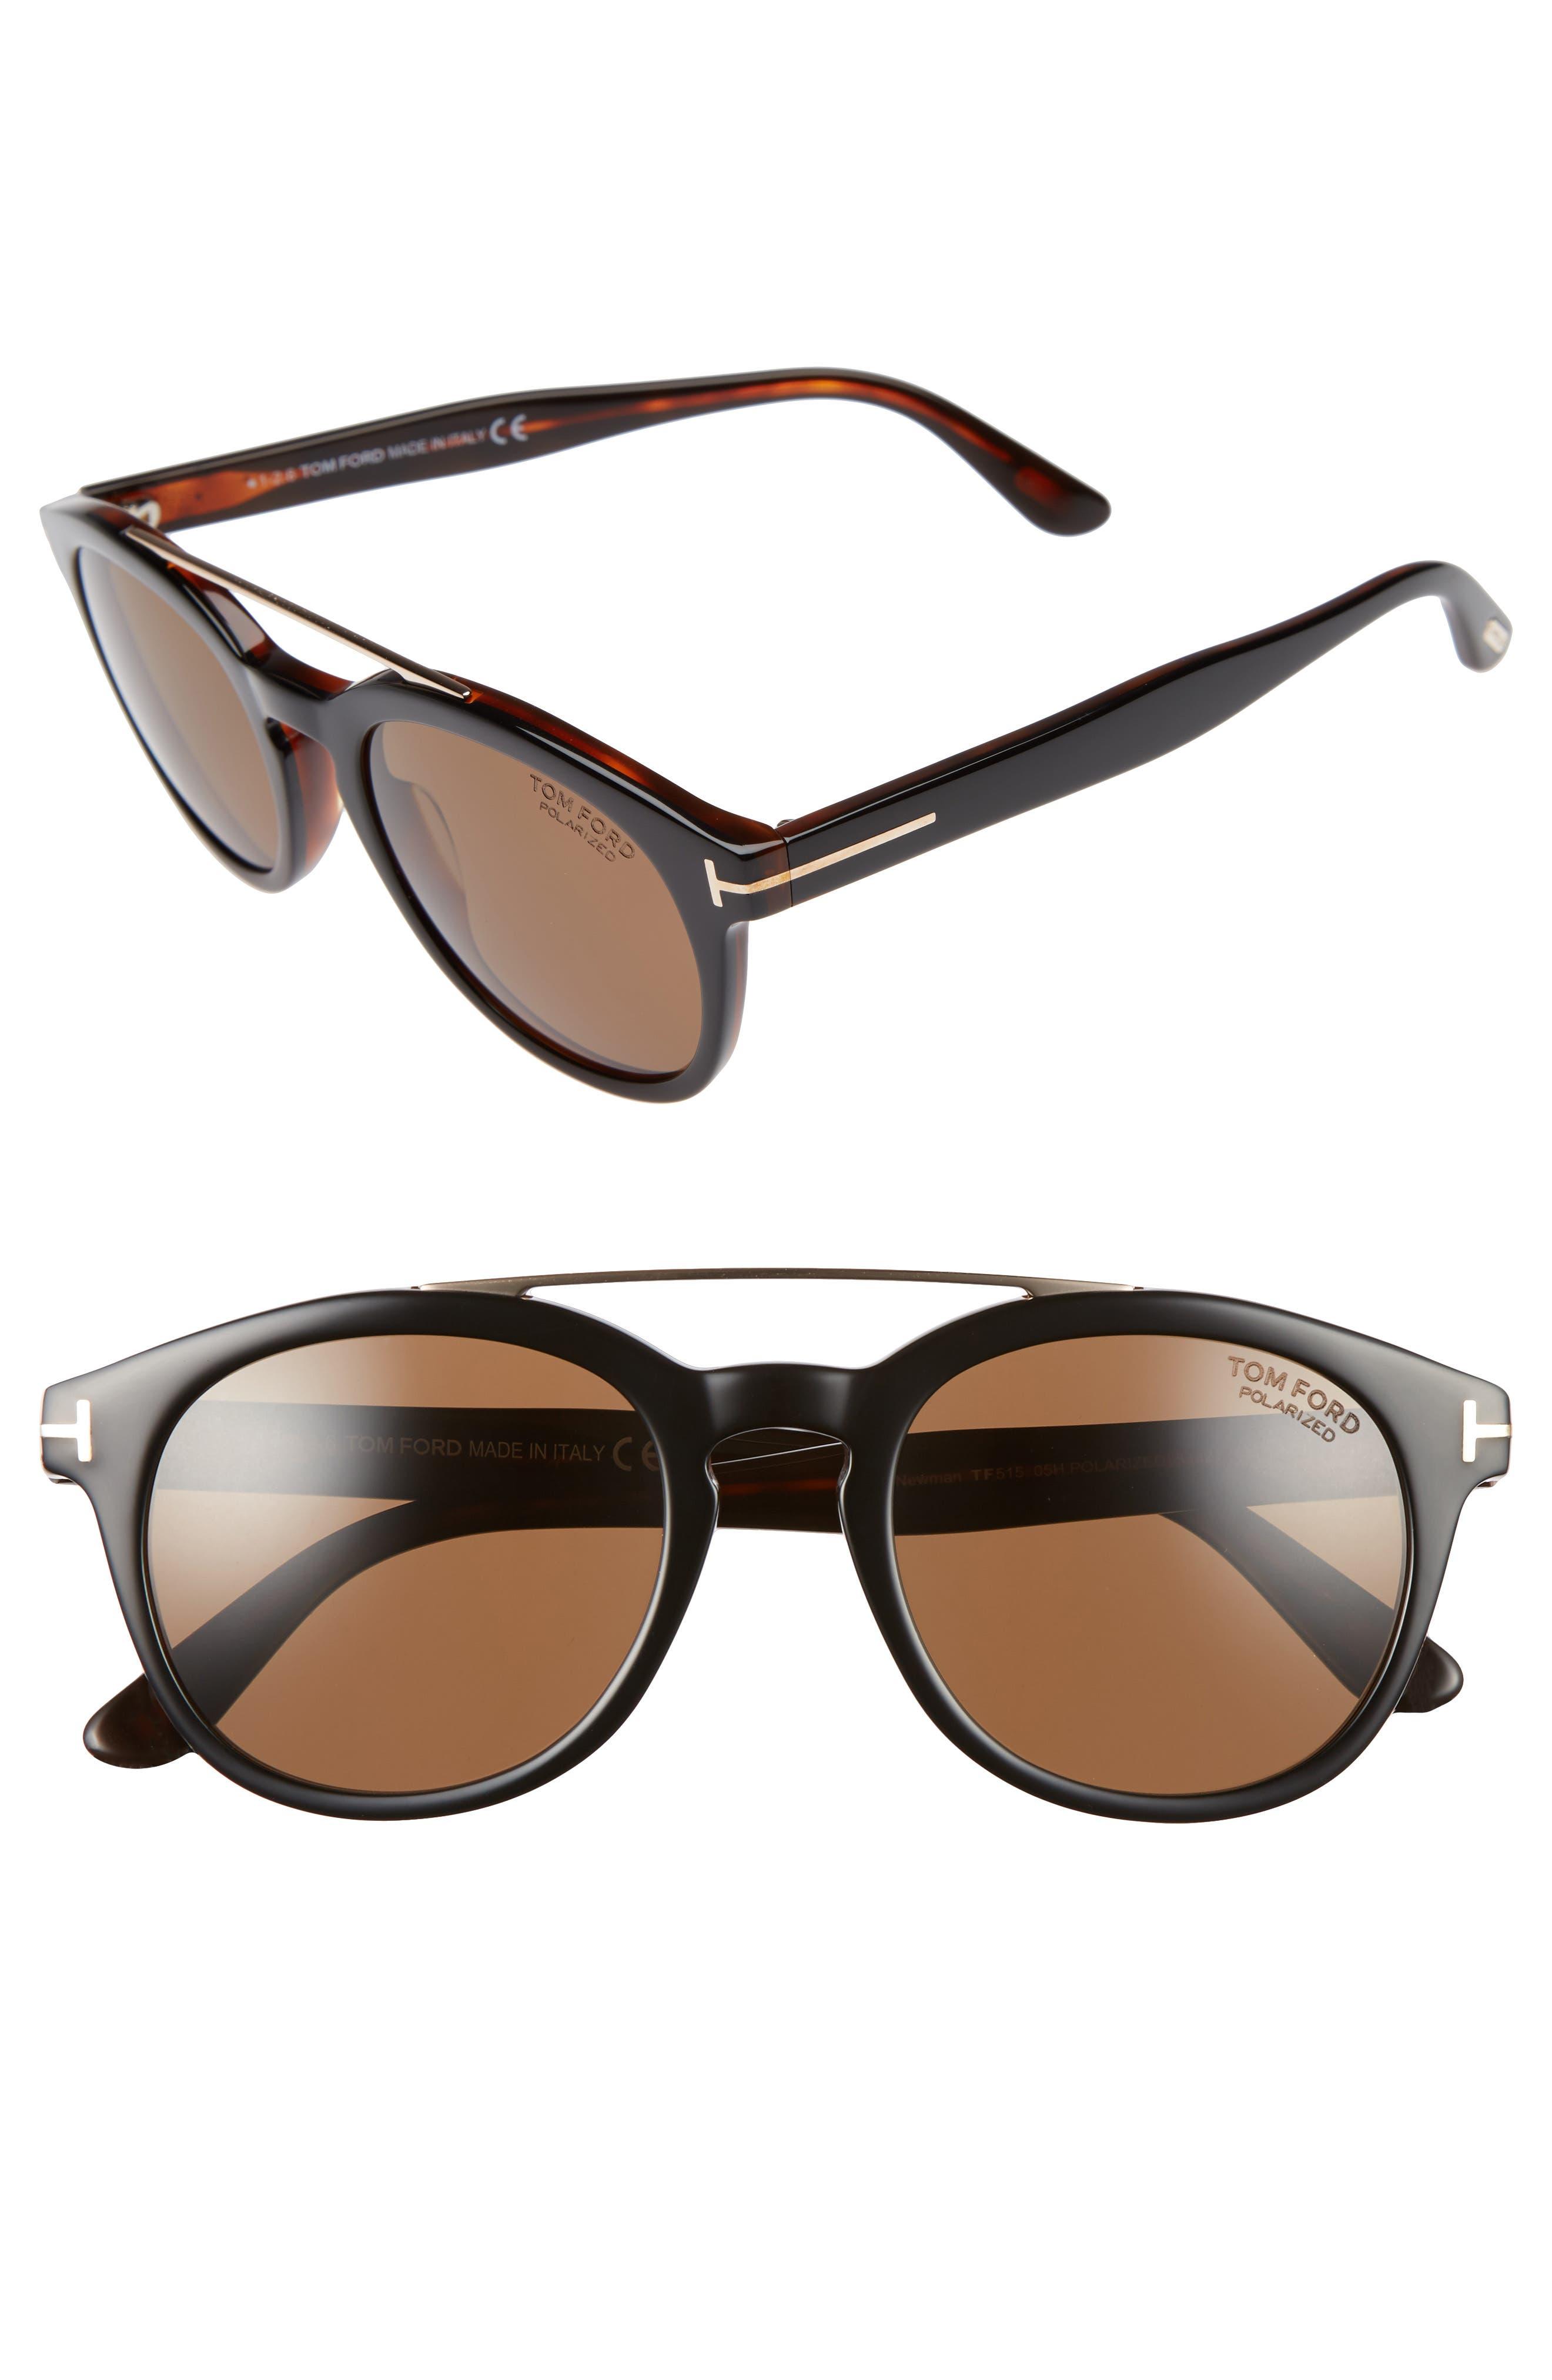 Newman 53mm Polarized Sunglasses,                         Main,                         color, 001